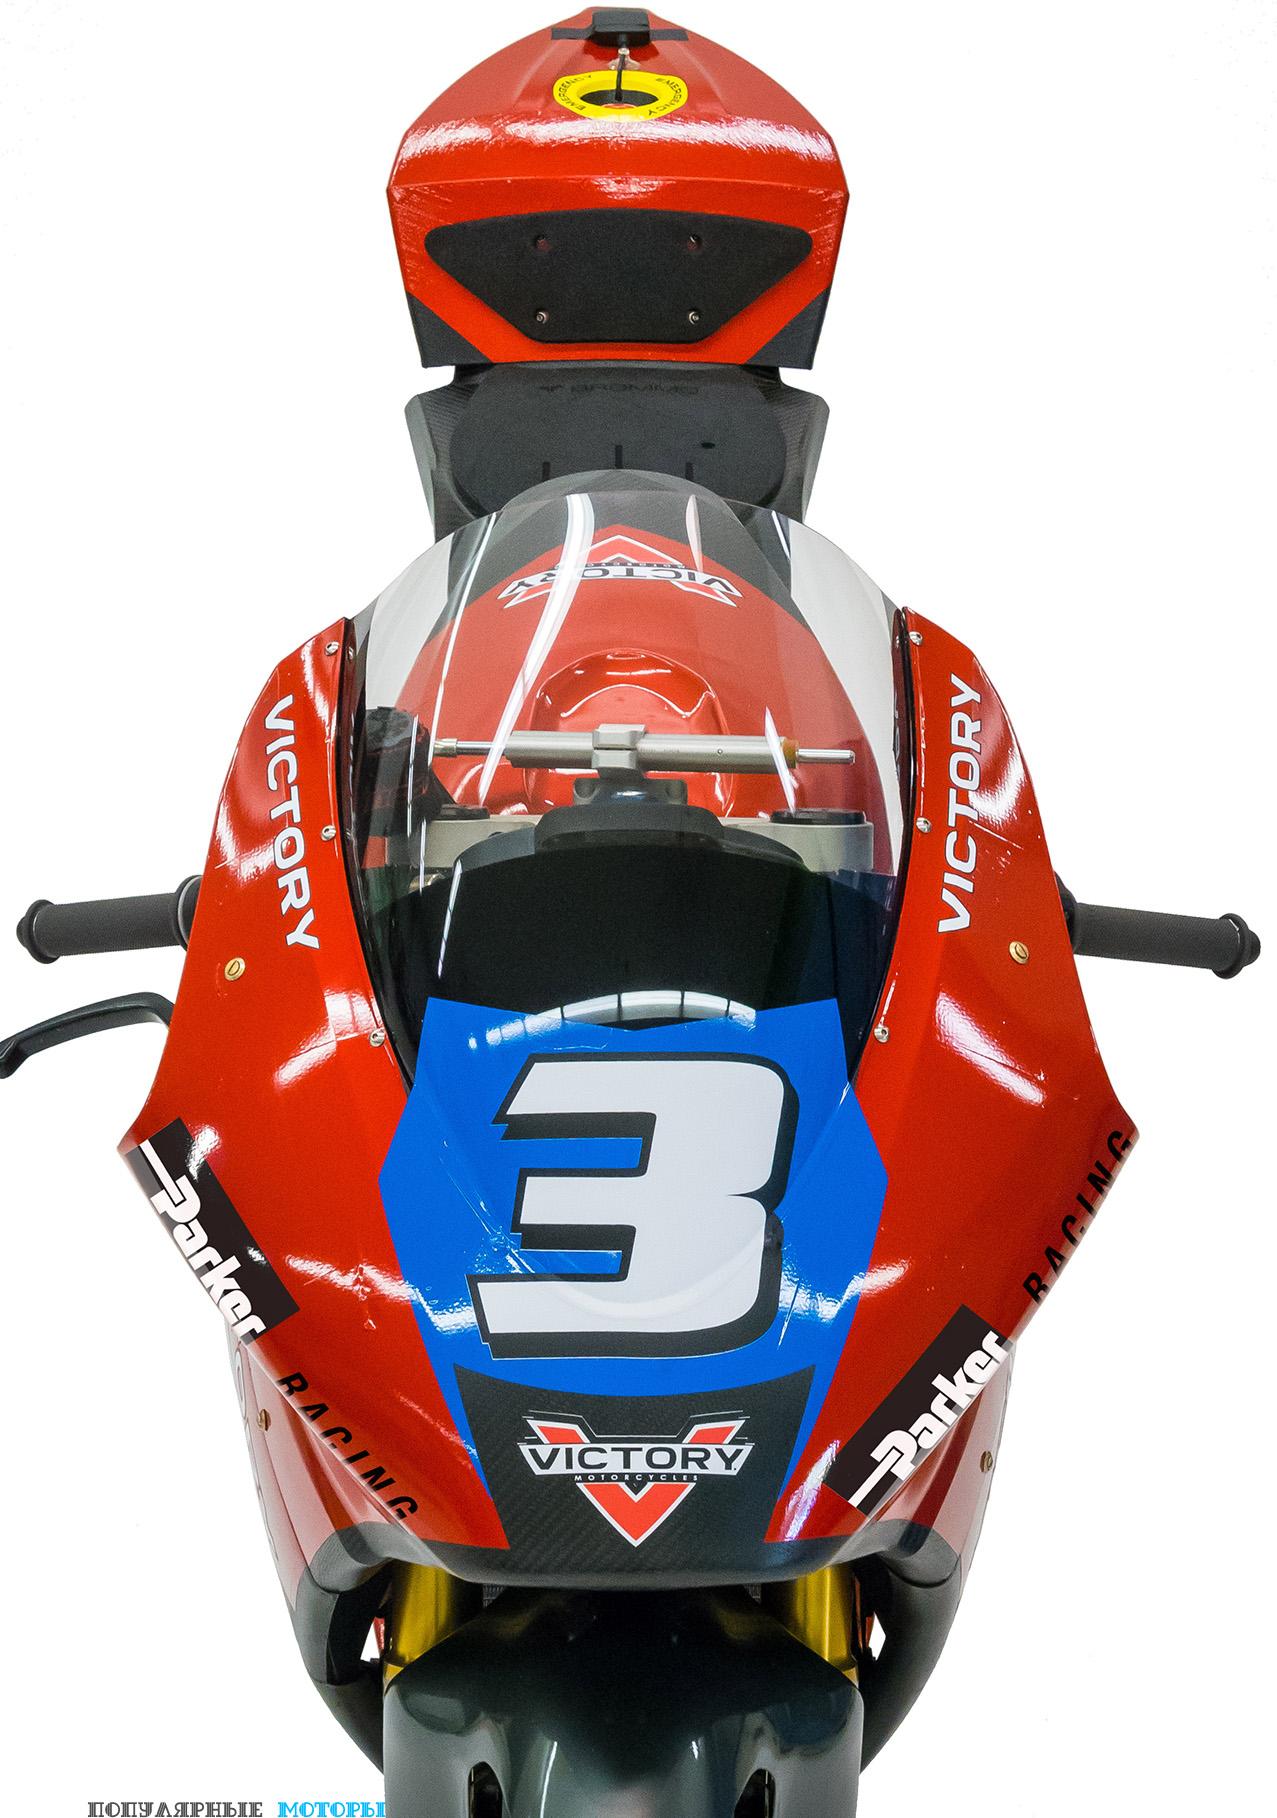 Фото прототипа электрического мотоцикла Victory